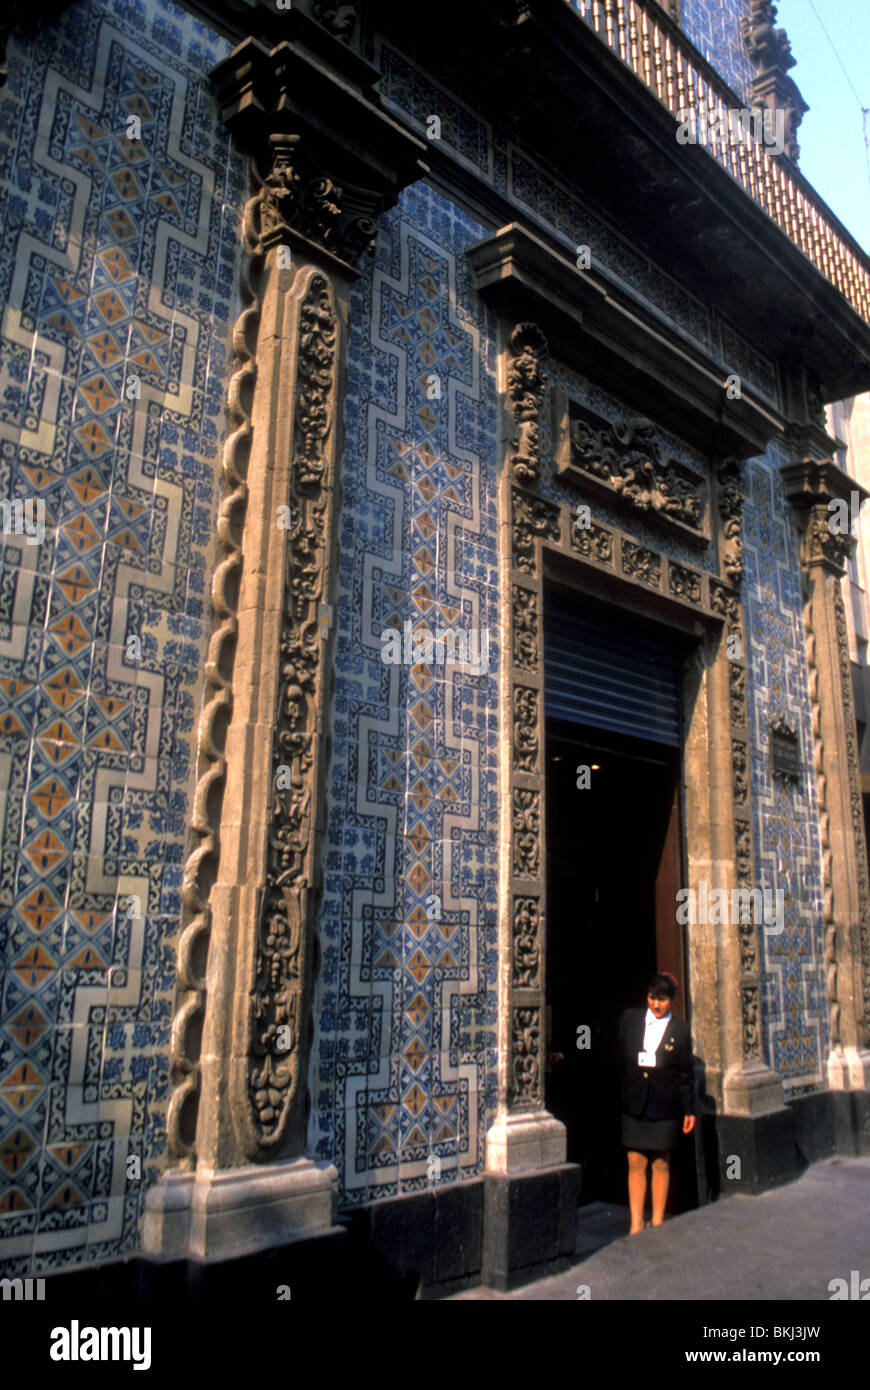 House of tiles mexico city mexico stock photo royalty for House of tiles mexico city